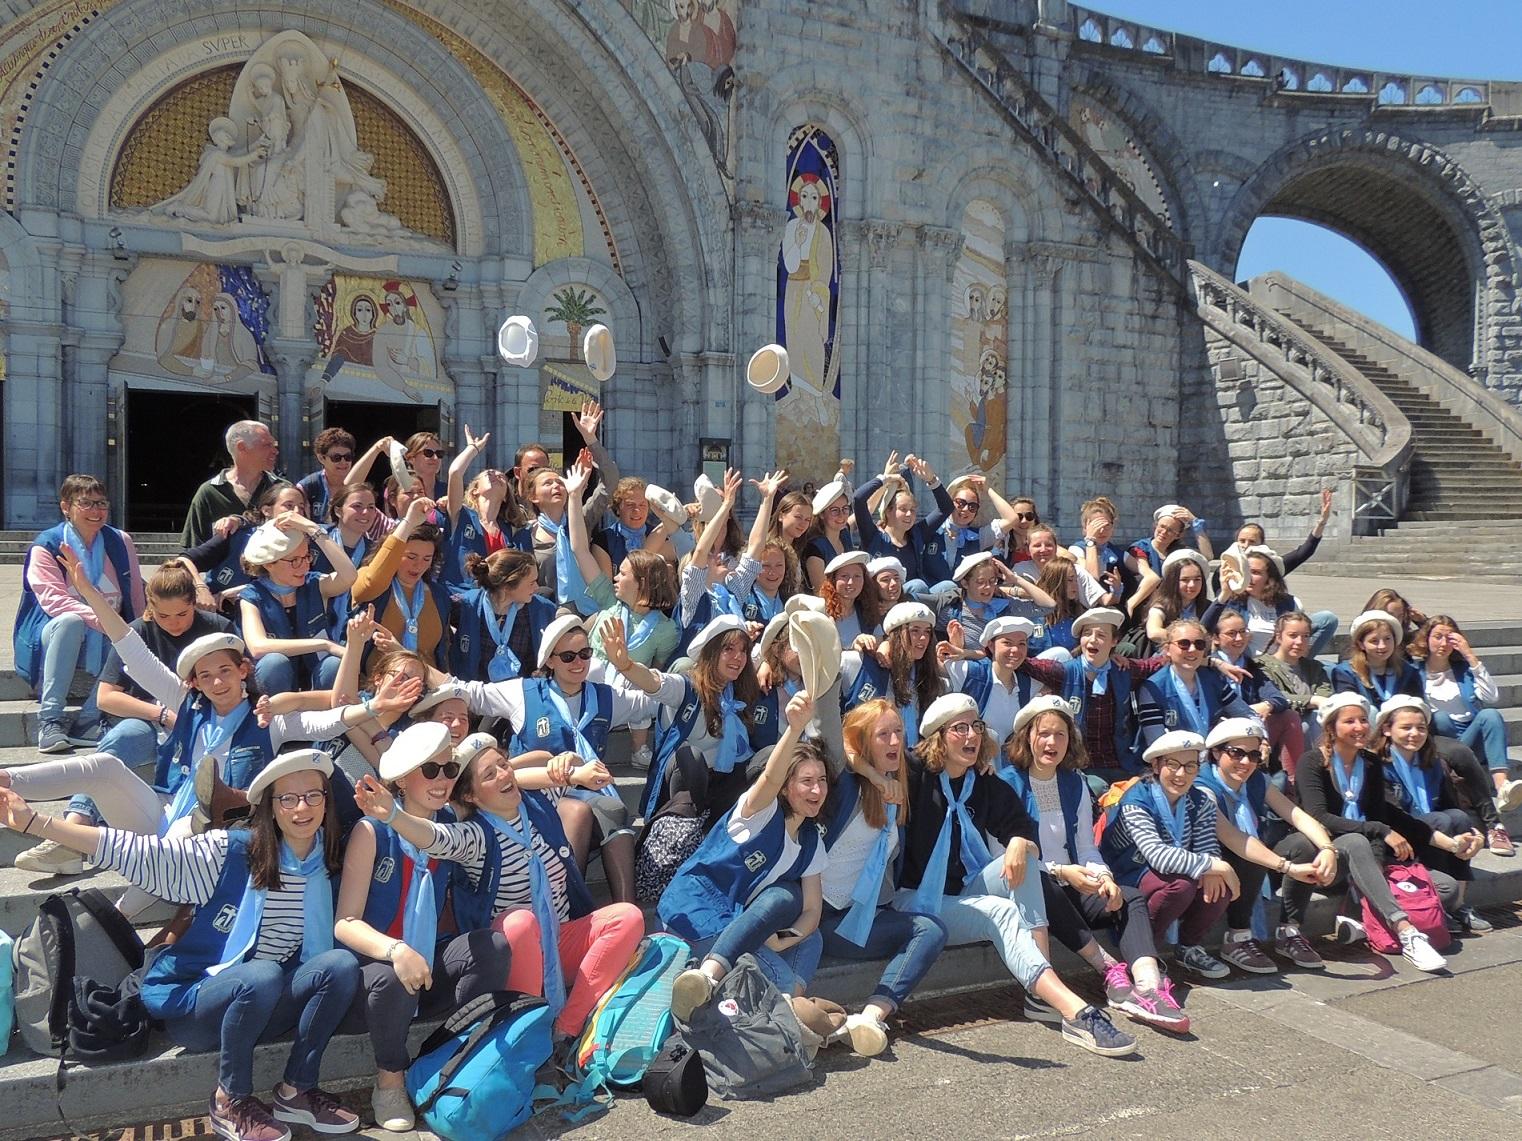 Lourdes avril 19